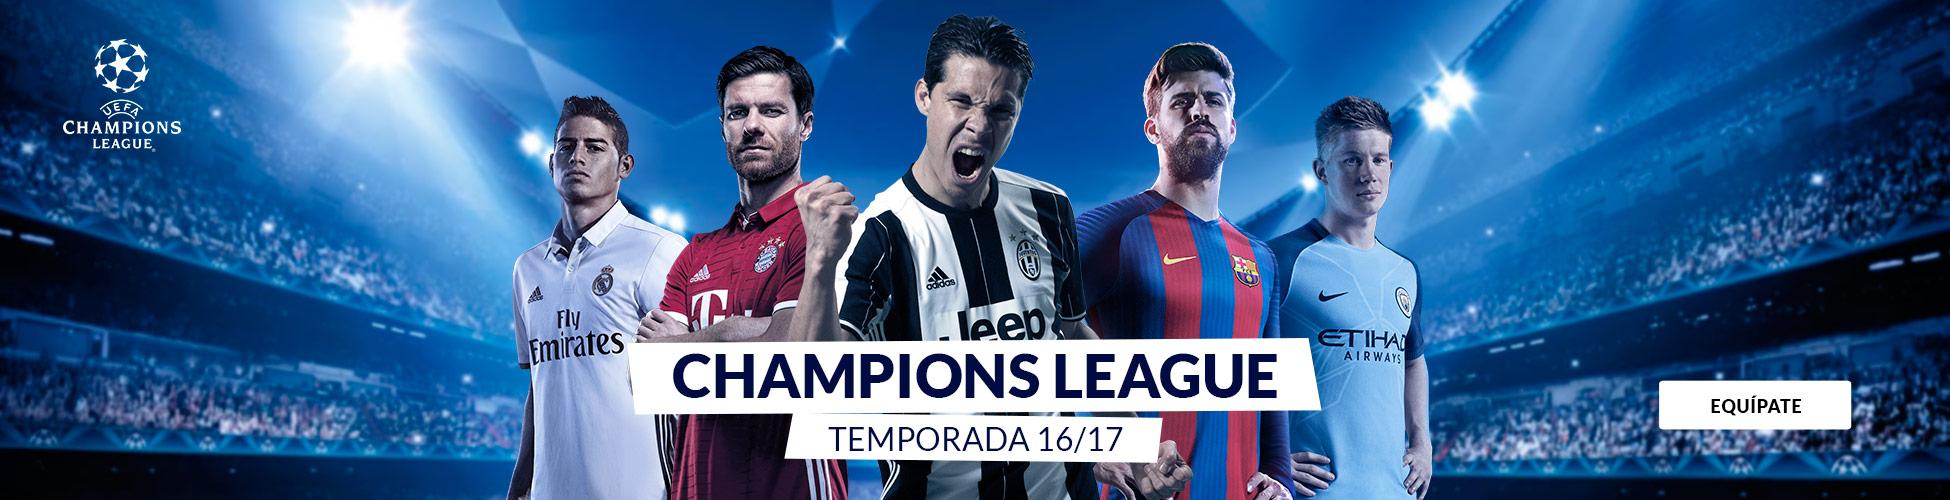 ChampionsLeague Octubre2016 ES